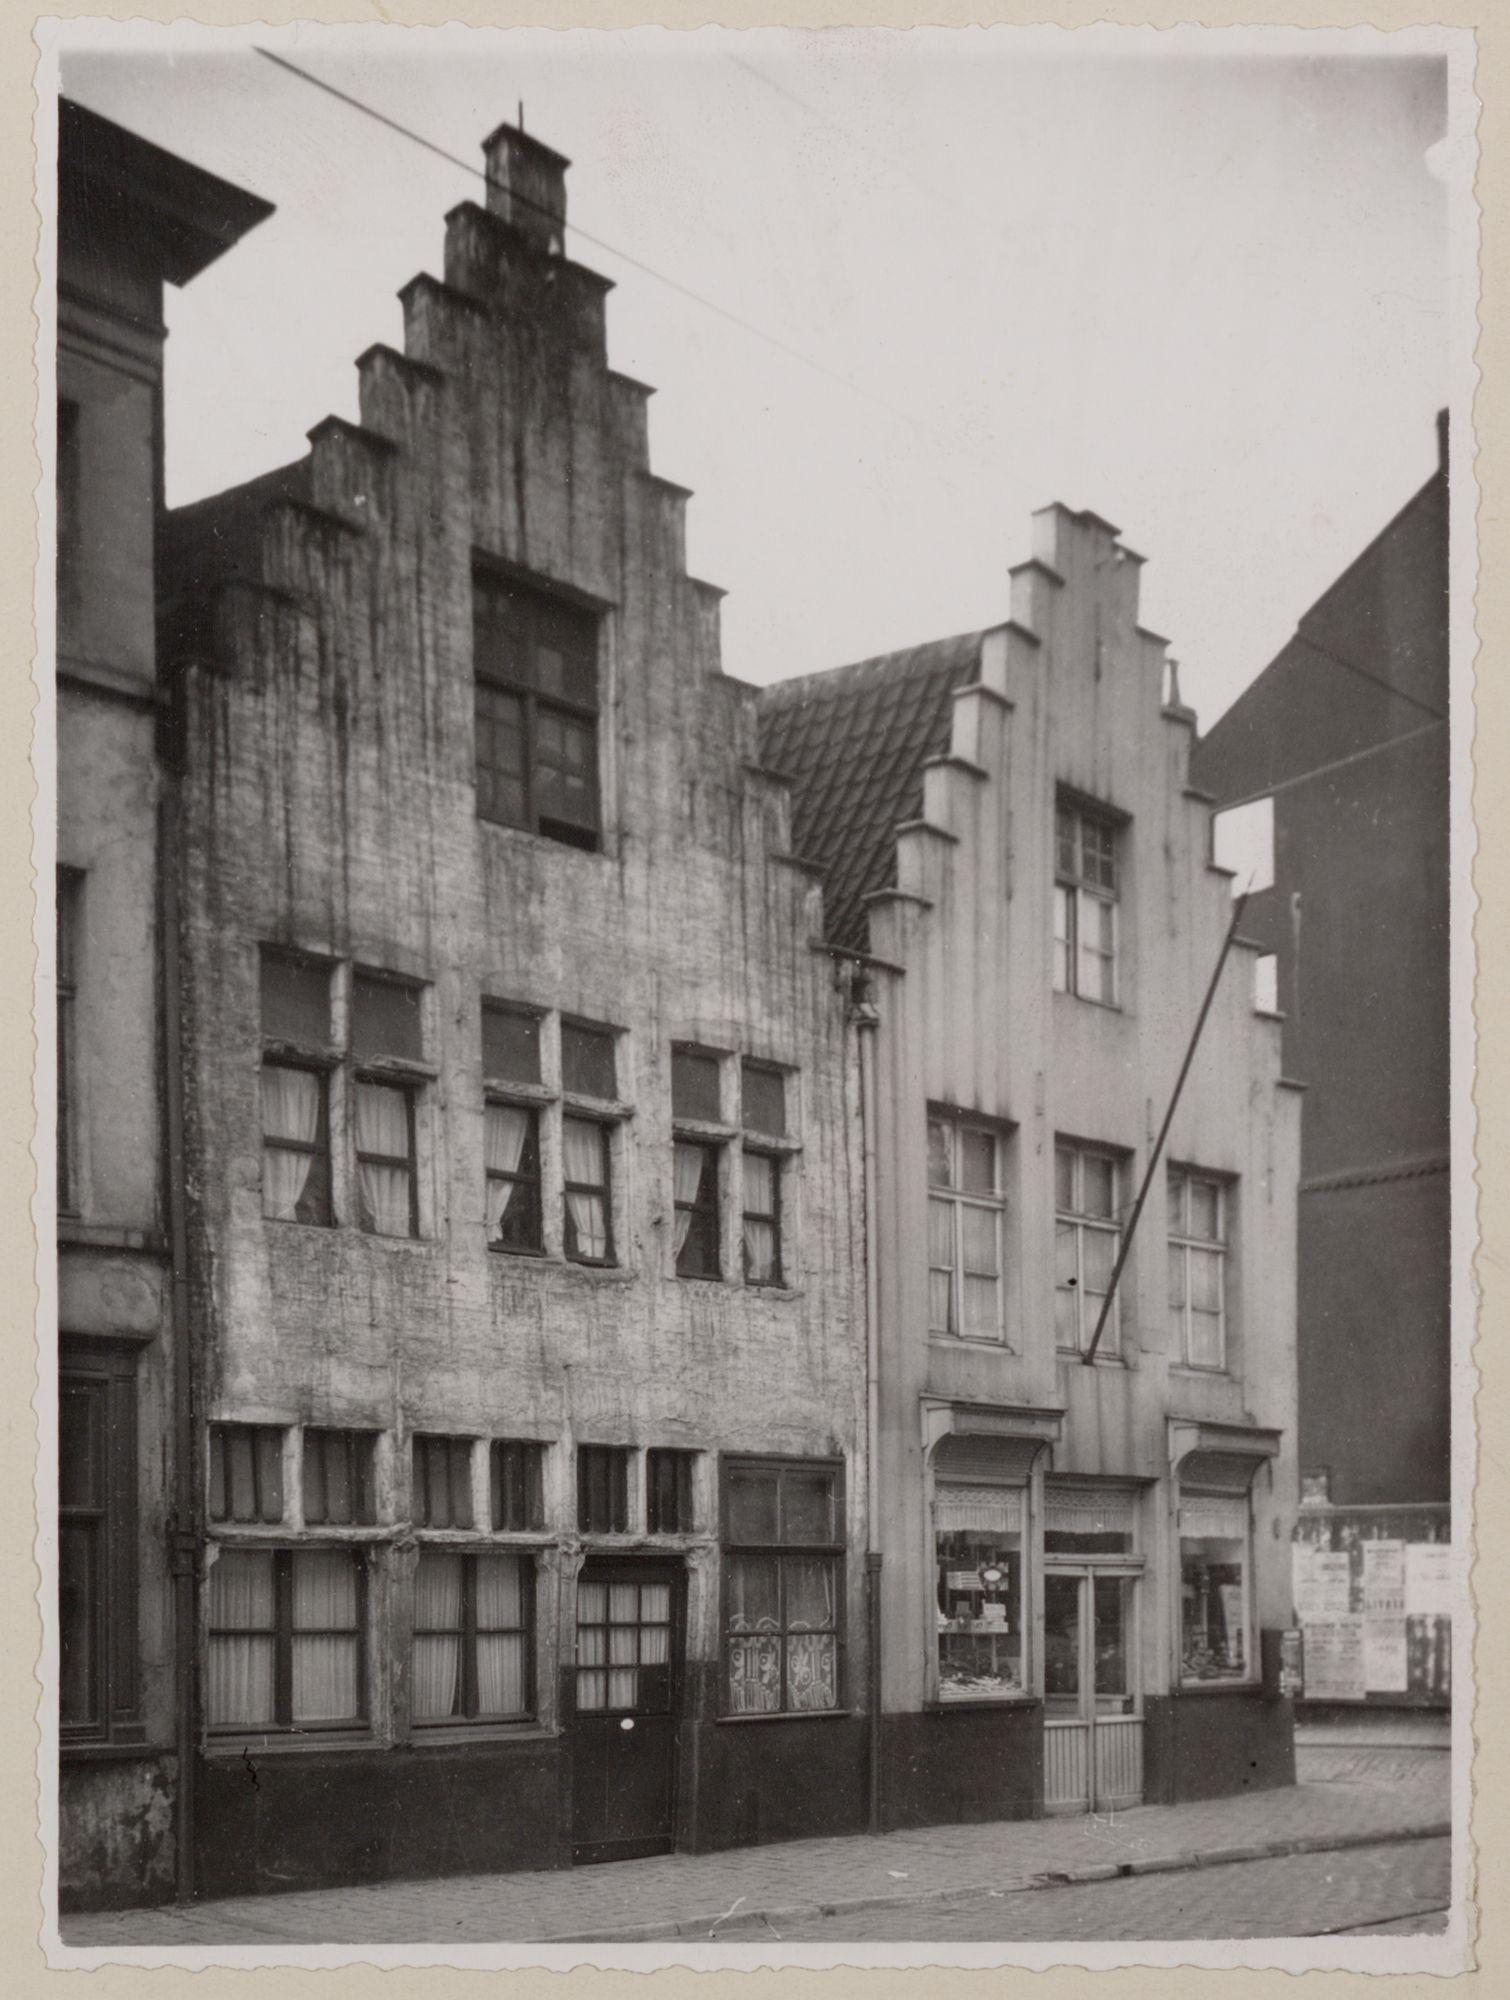 Gent: Trapgevelhuizen, Lange Violettestraat